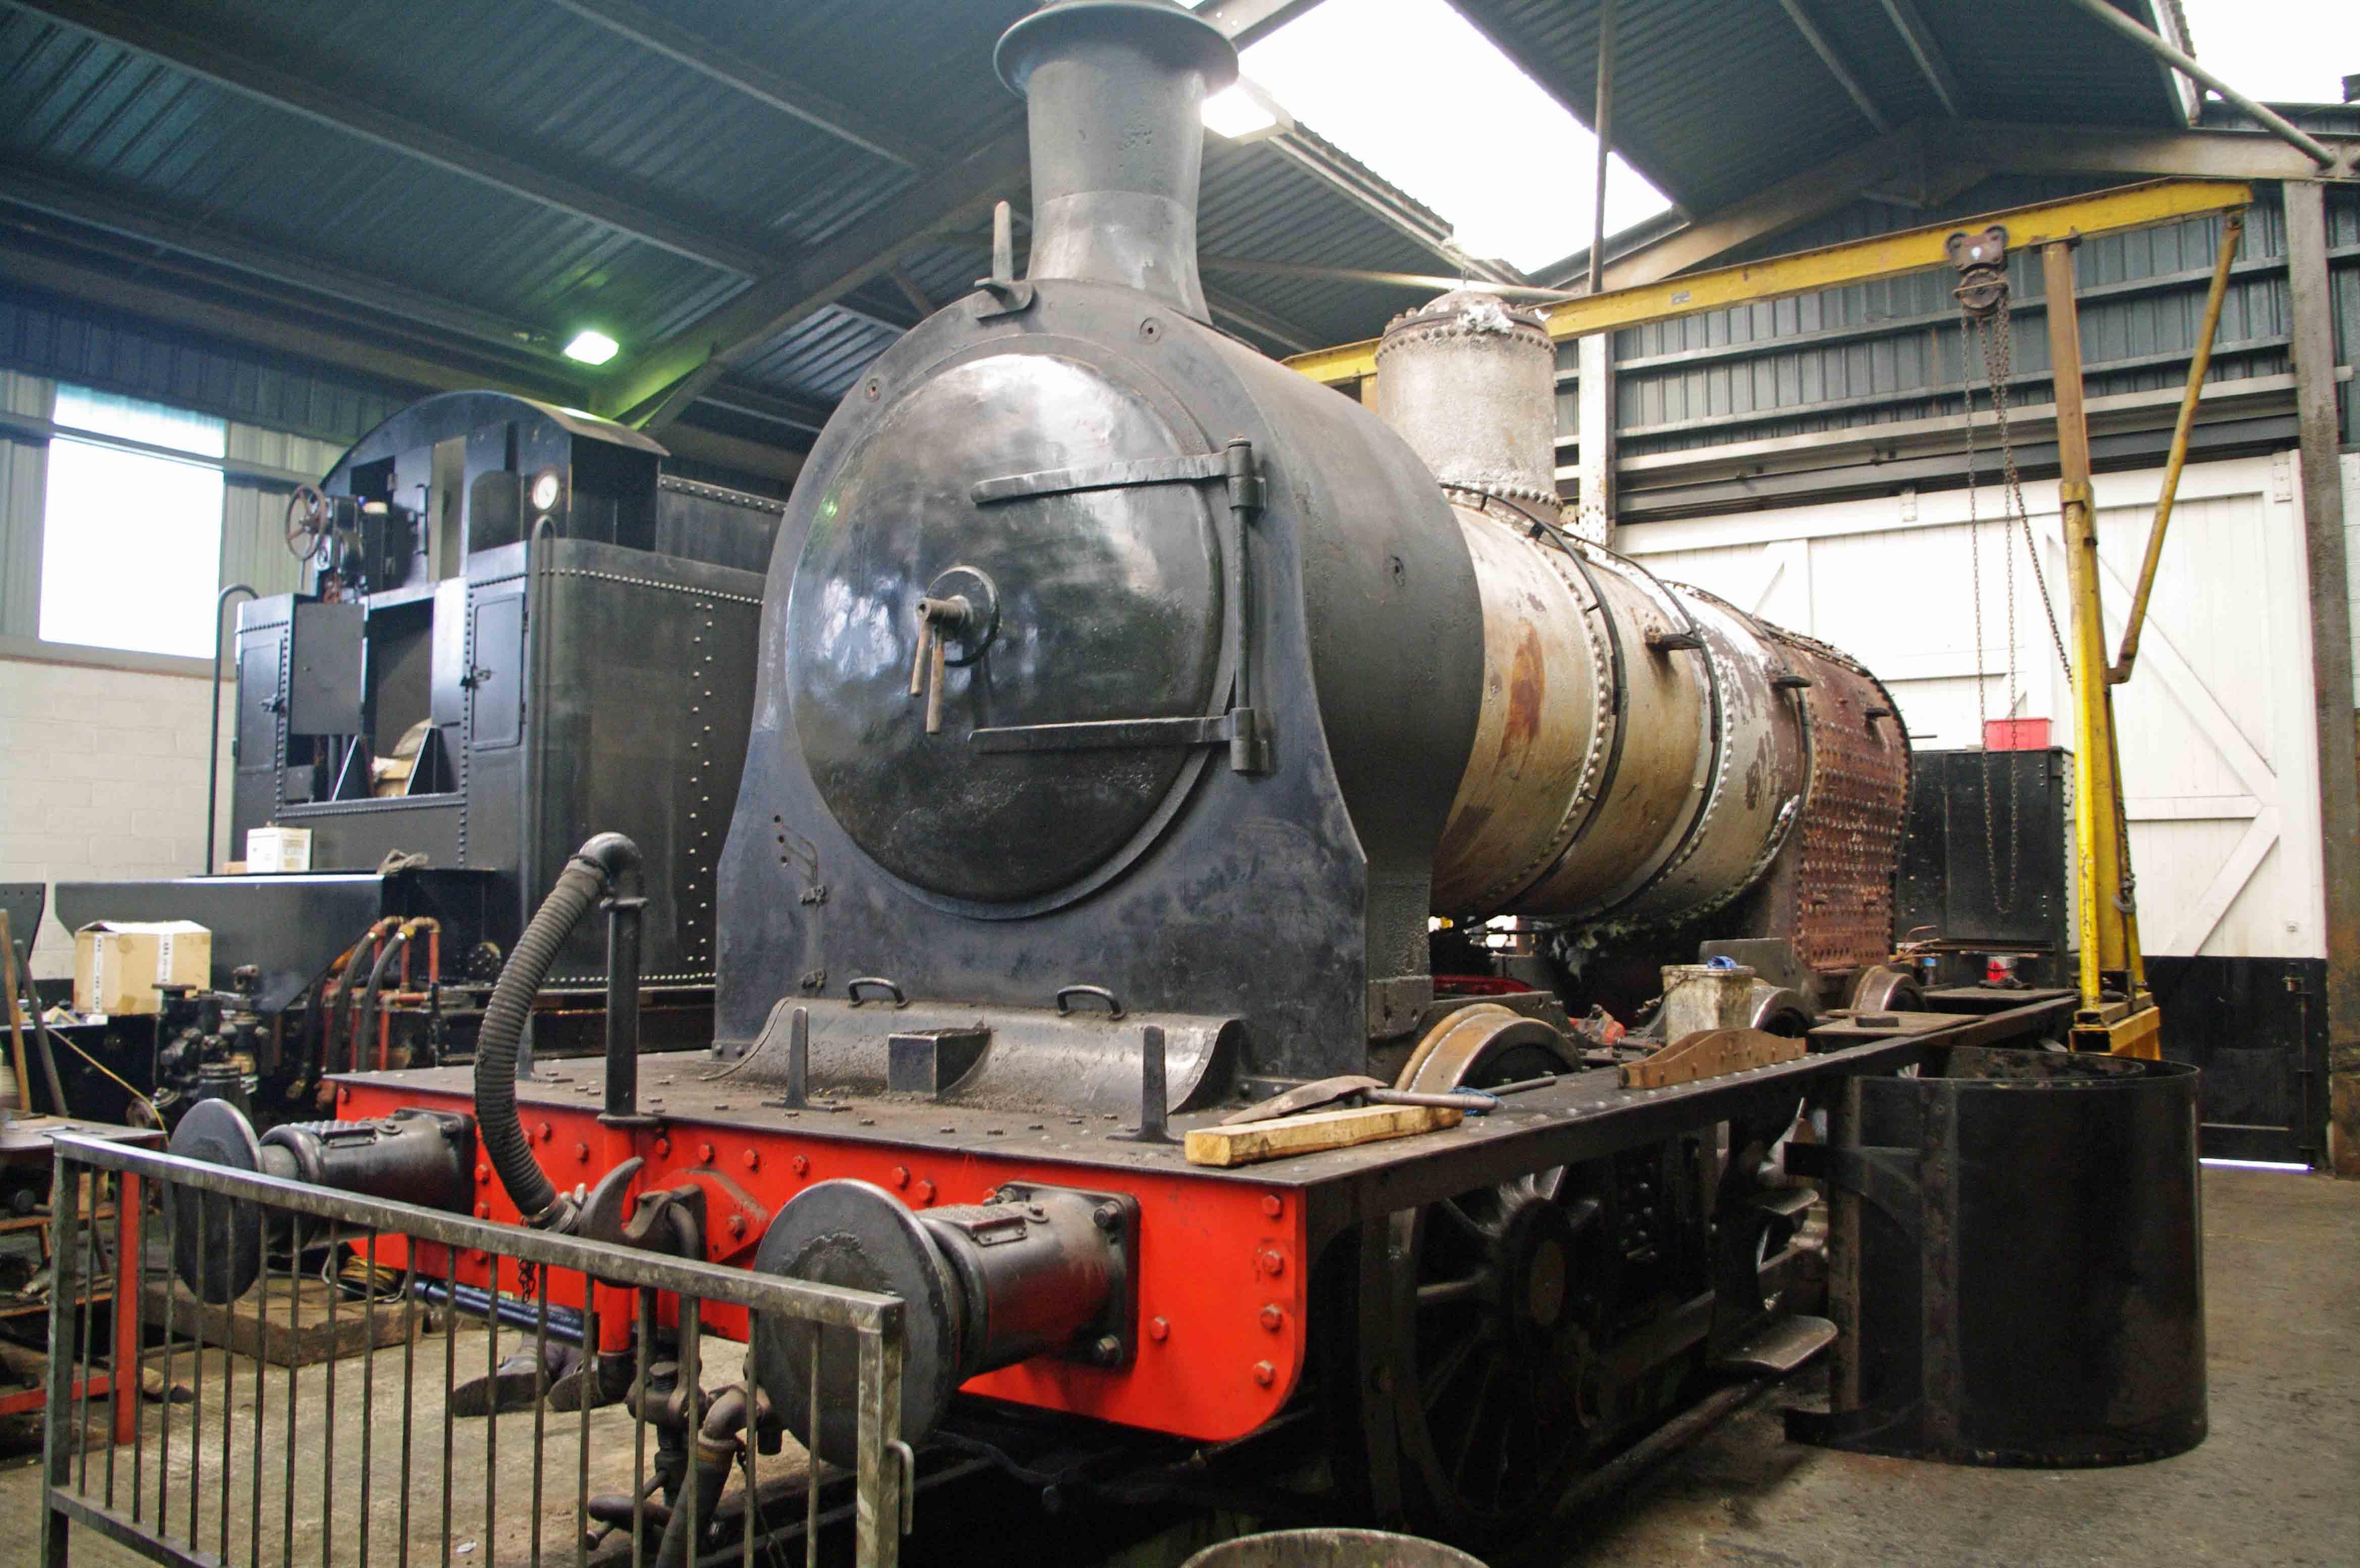 85 under restoration at Haworth - 2010.jpg